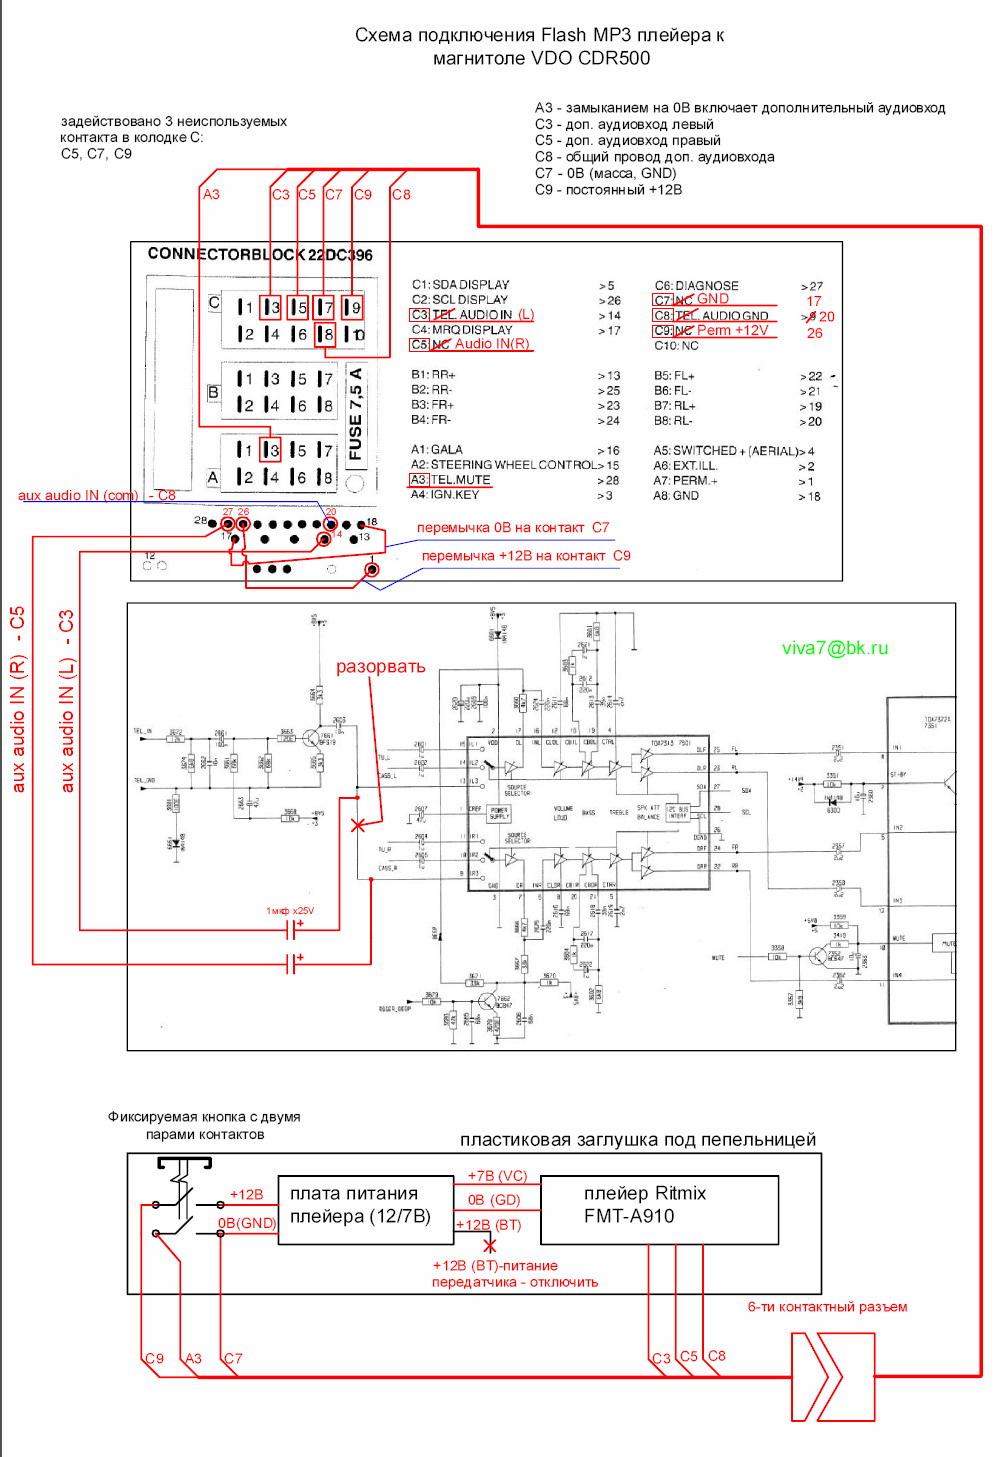 vauxhall cdr 500 wiring diagram detailed schematic diagrams rh 4rmotorsports com